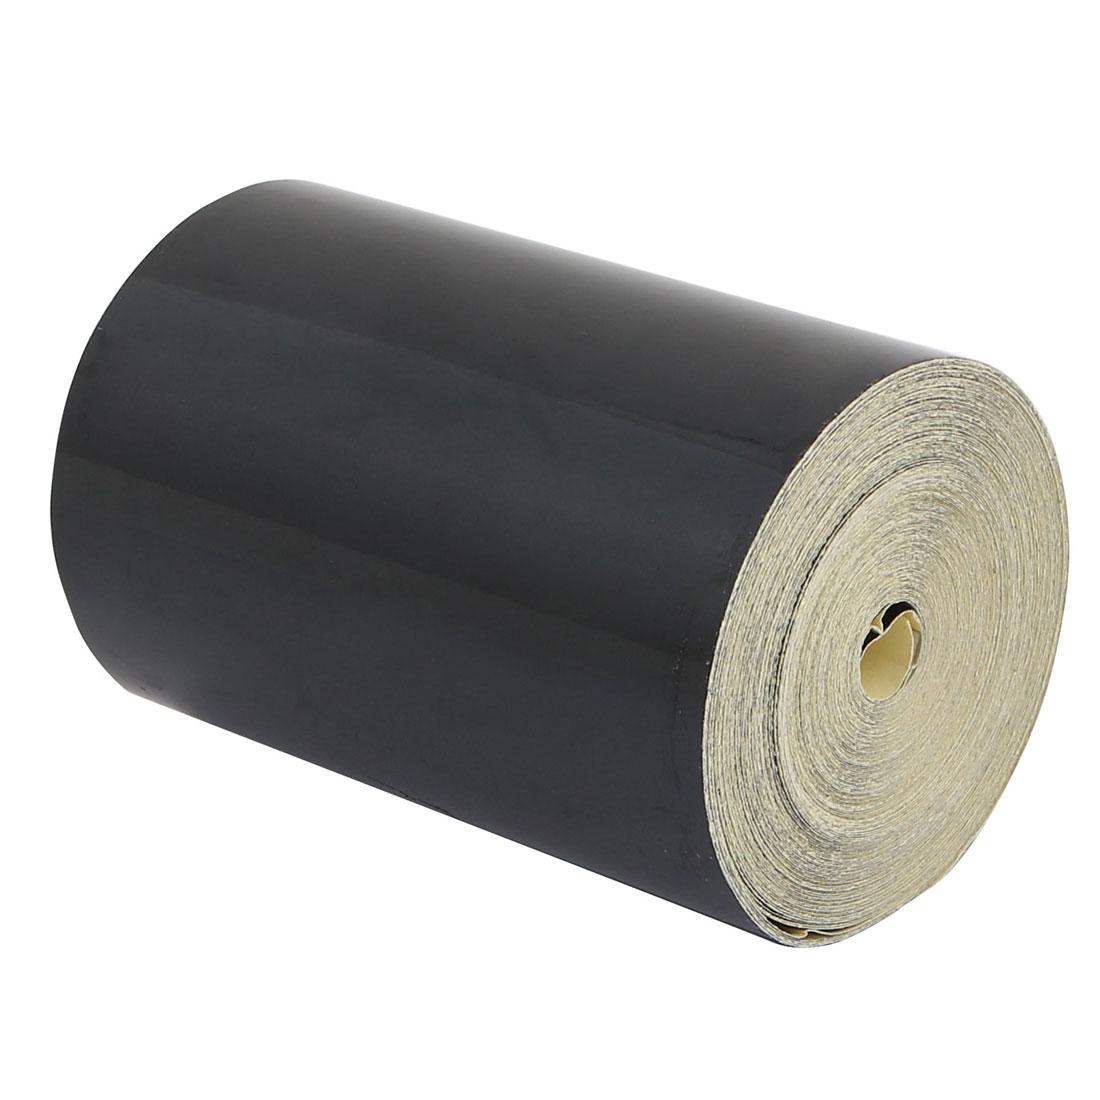 Single Sided Adhesive Reflective Warning Tape Black 15M Length 10cm Width